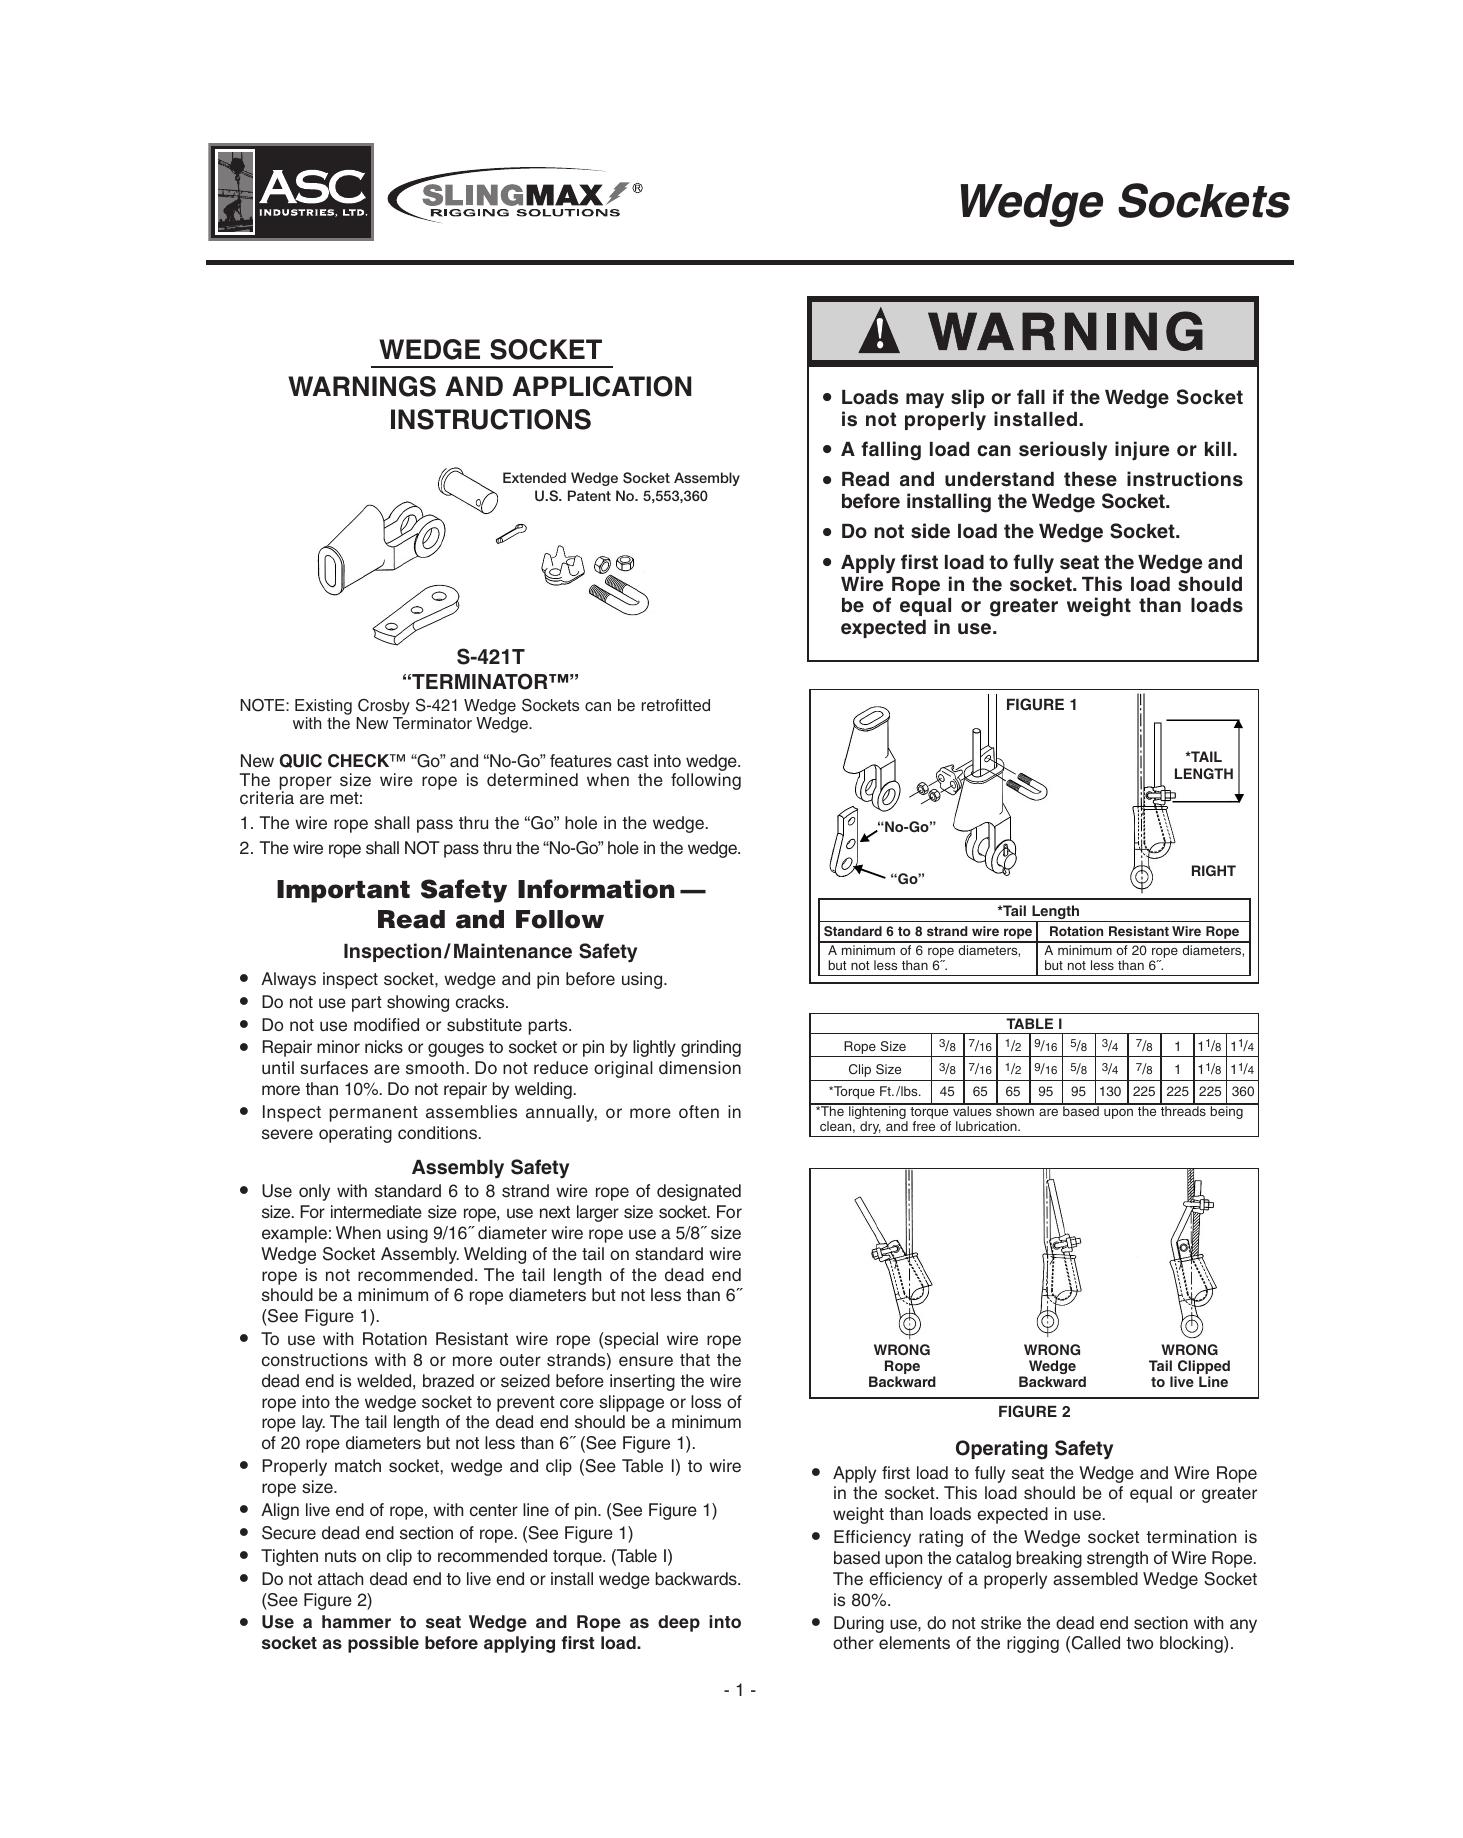 Wedge Sockets - ASC Industries LTD.